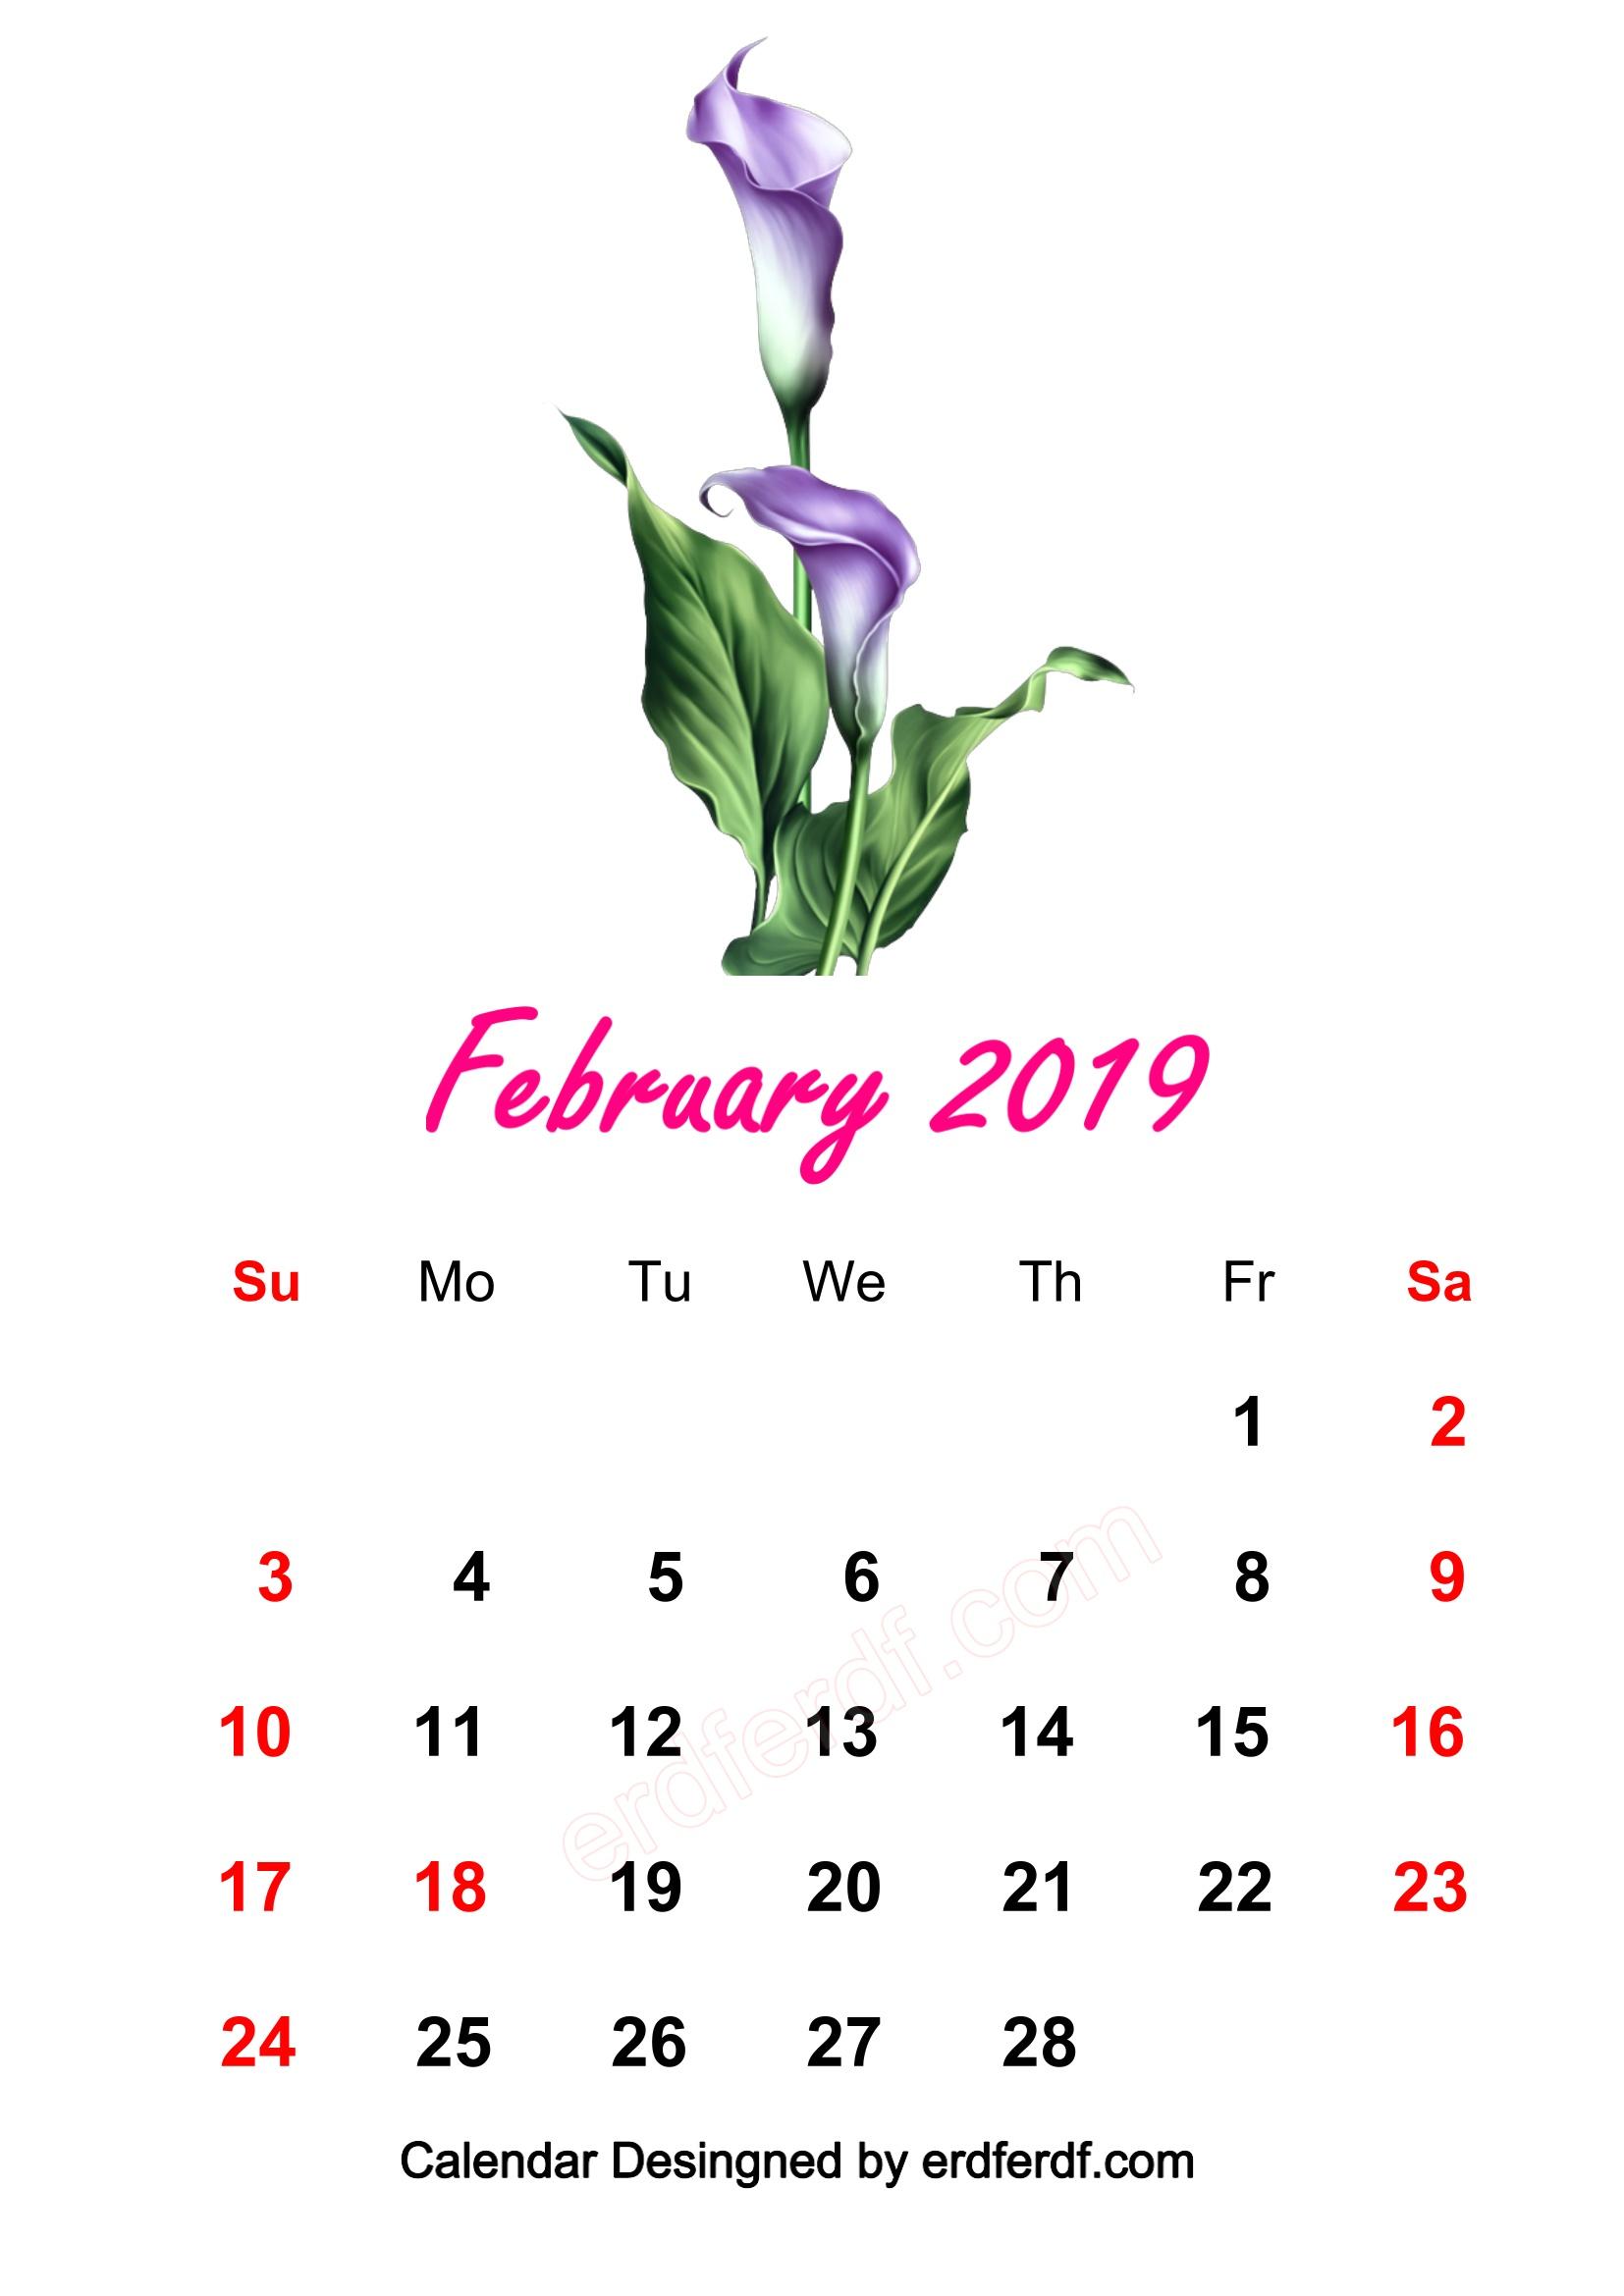 6 February 2019 HD Calendar Wallpapers